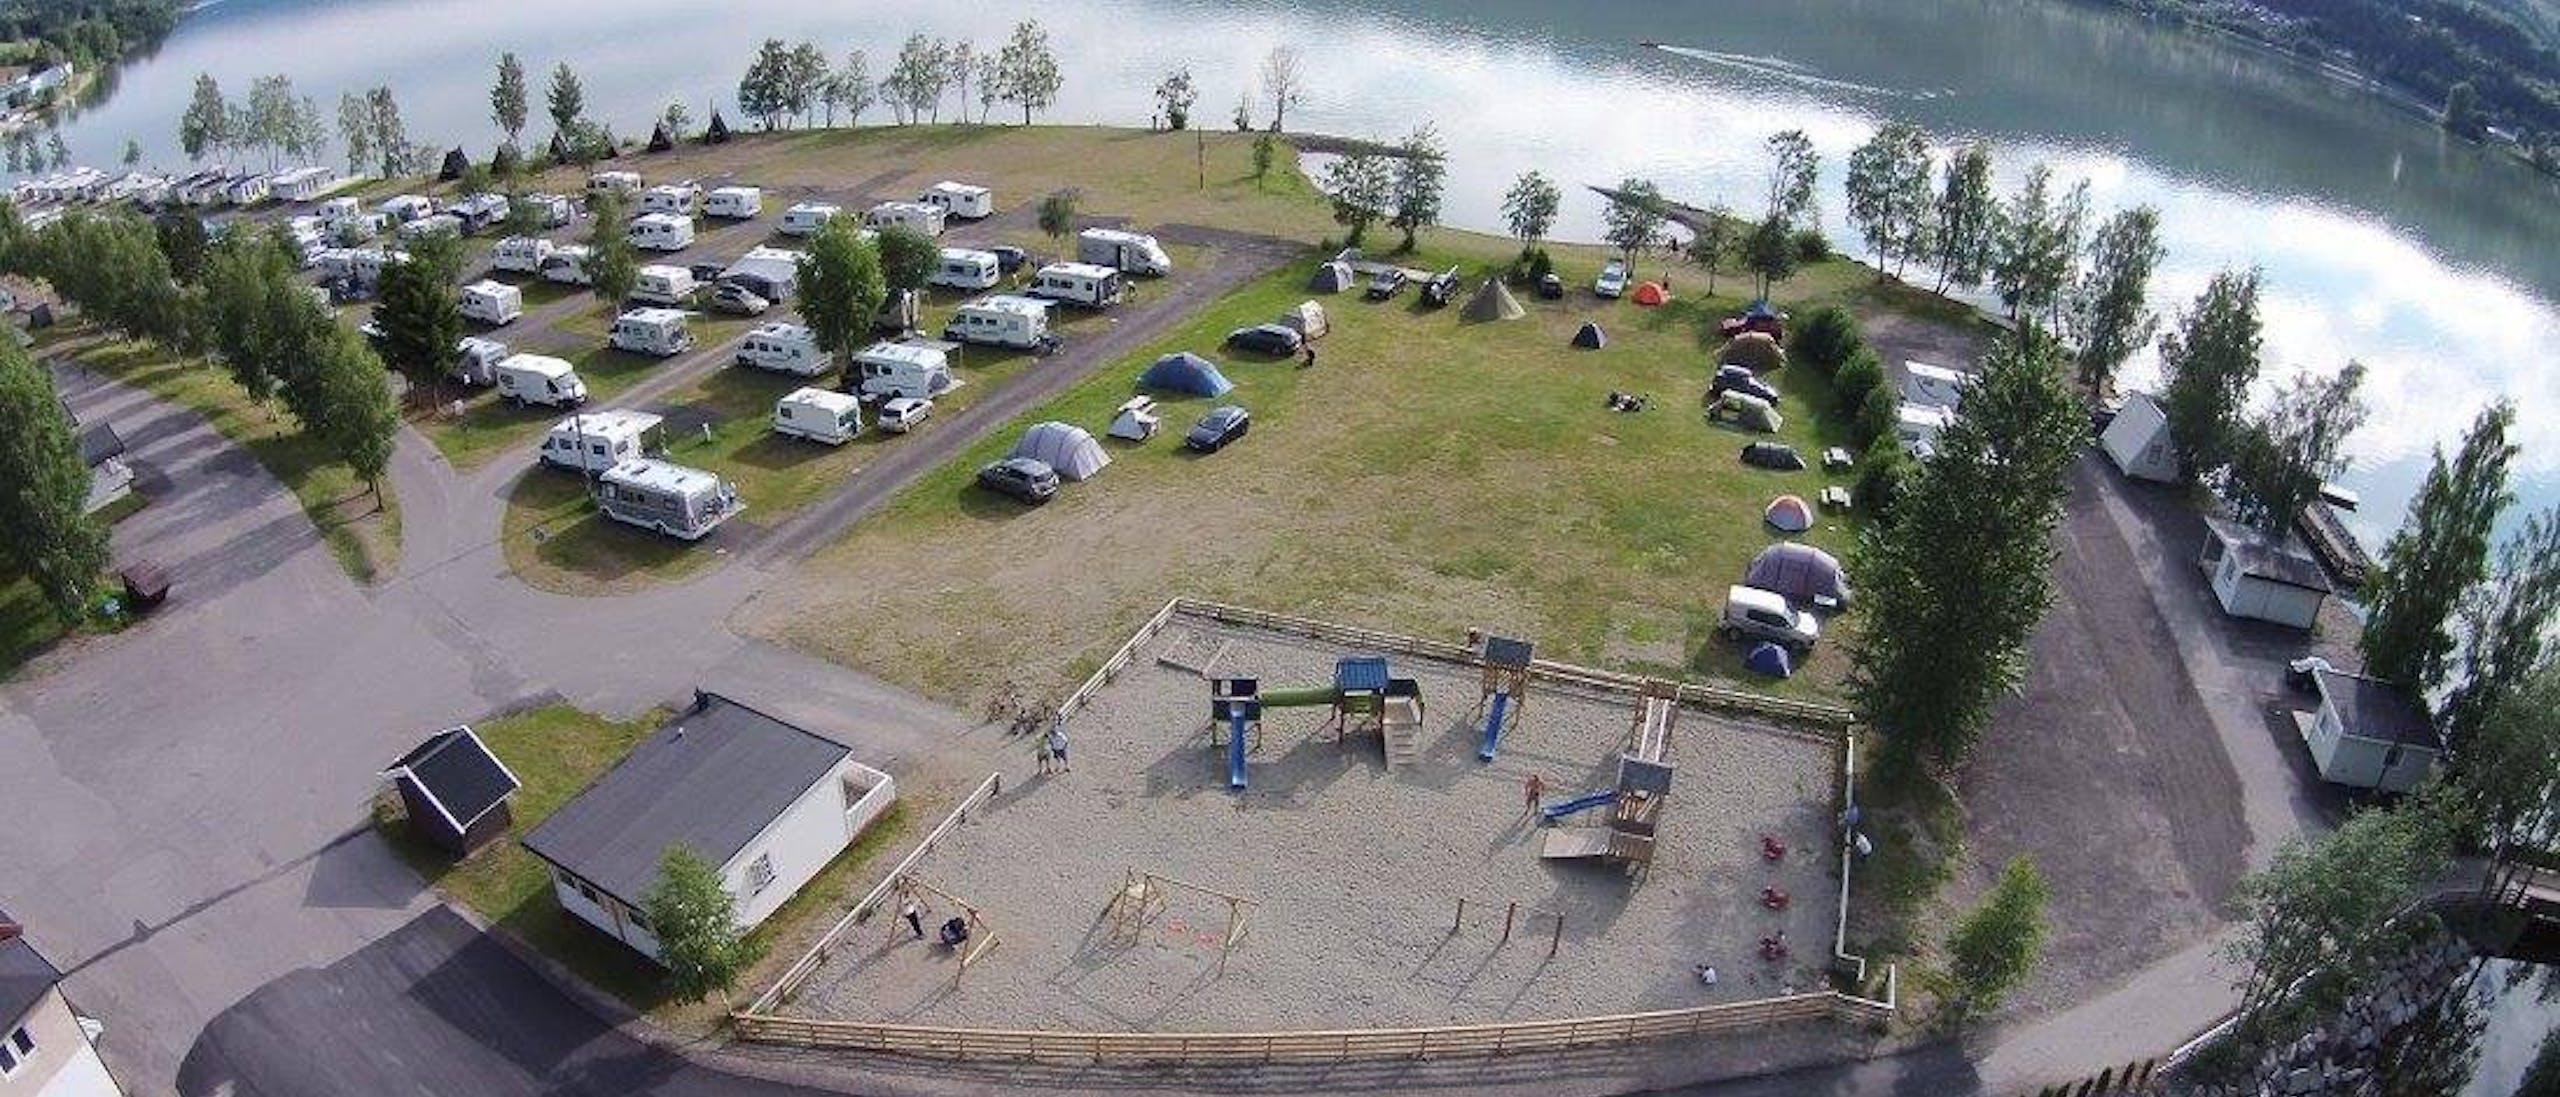 Lillehammer Camping Fly